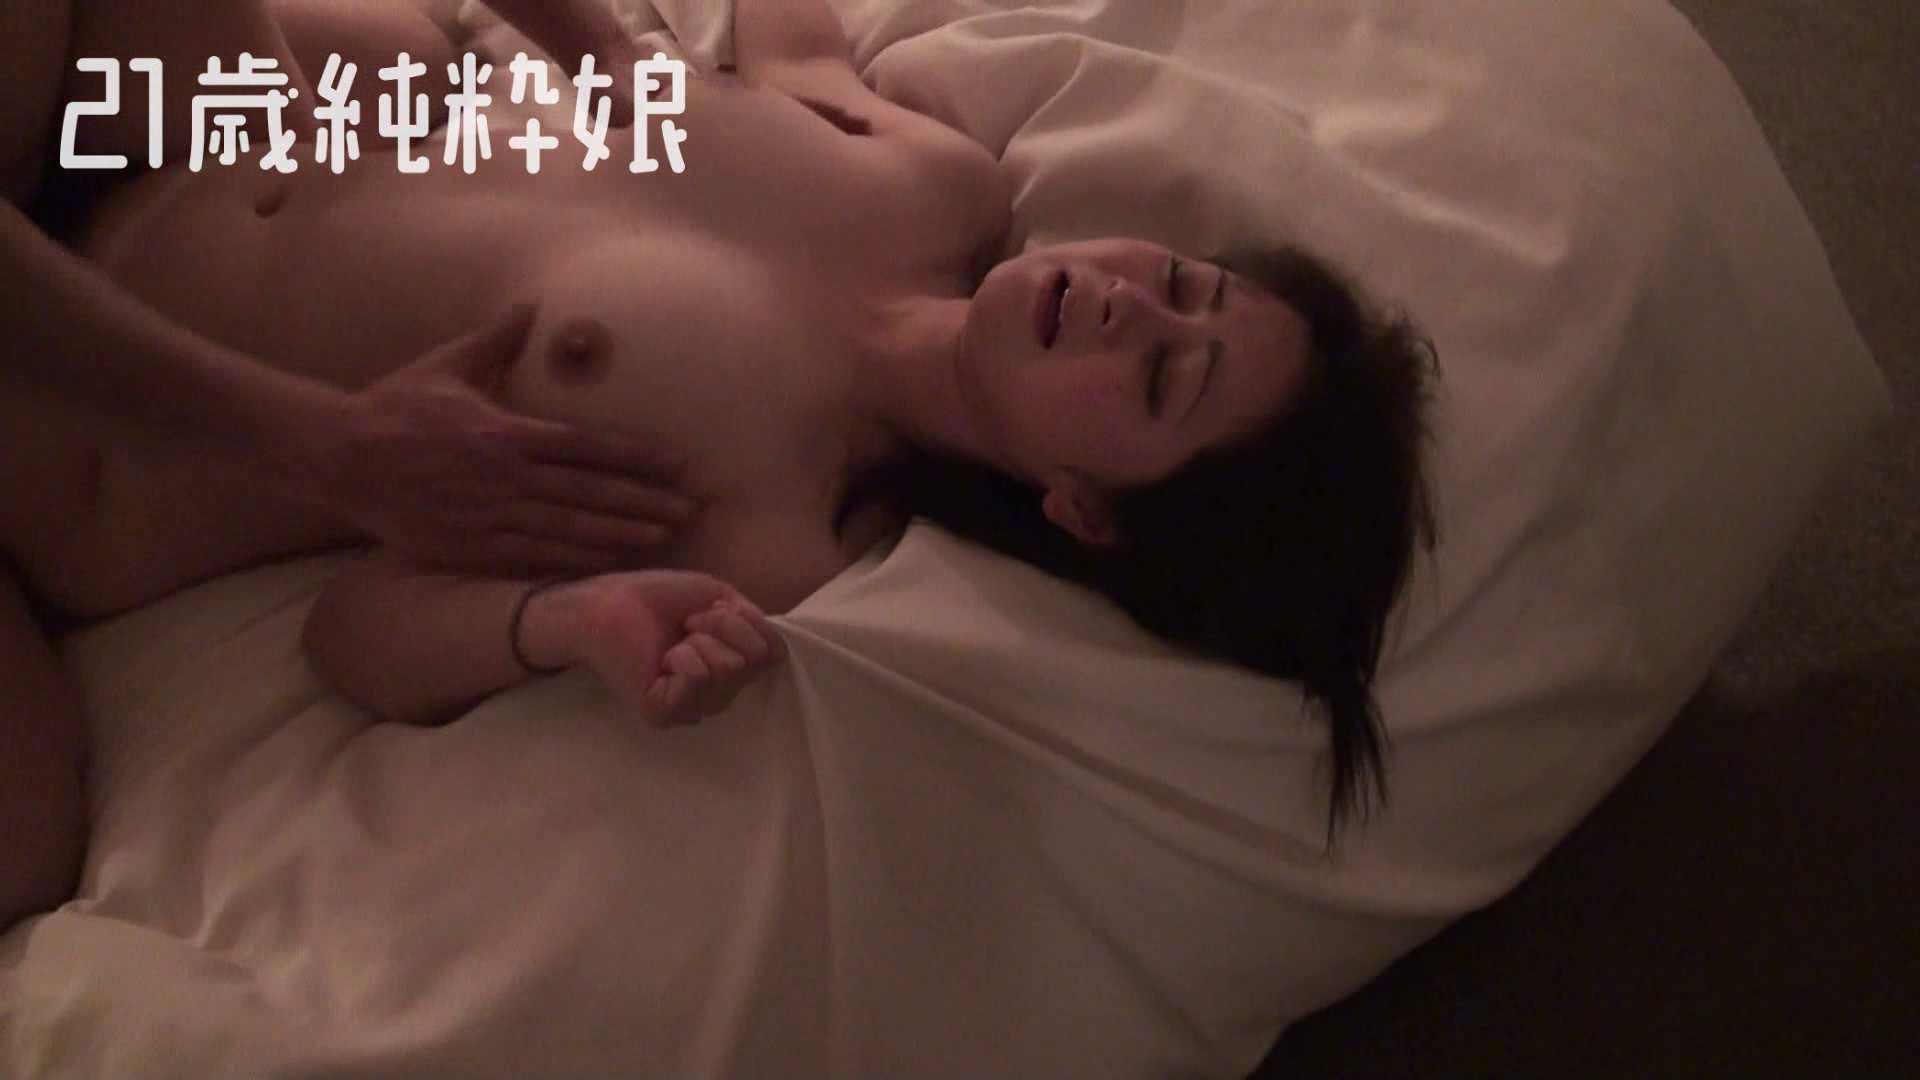 Gカップ21歳純粋嬢第2弾Vol.4 学校 アダルト動画キャプチャ 73pic 62